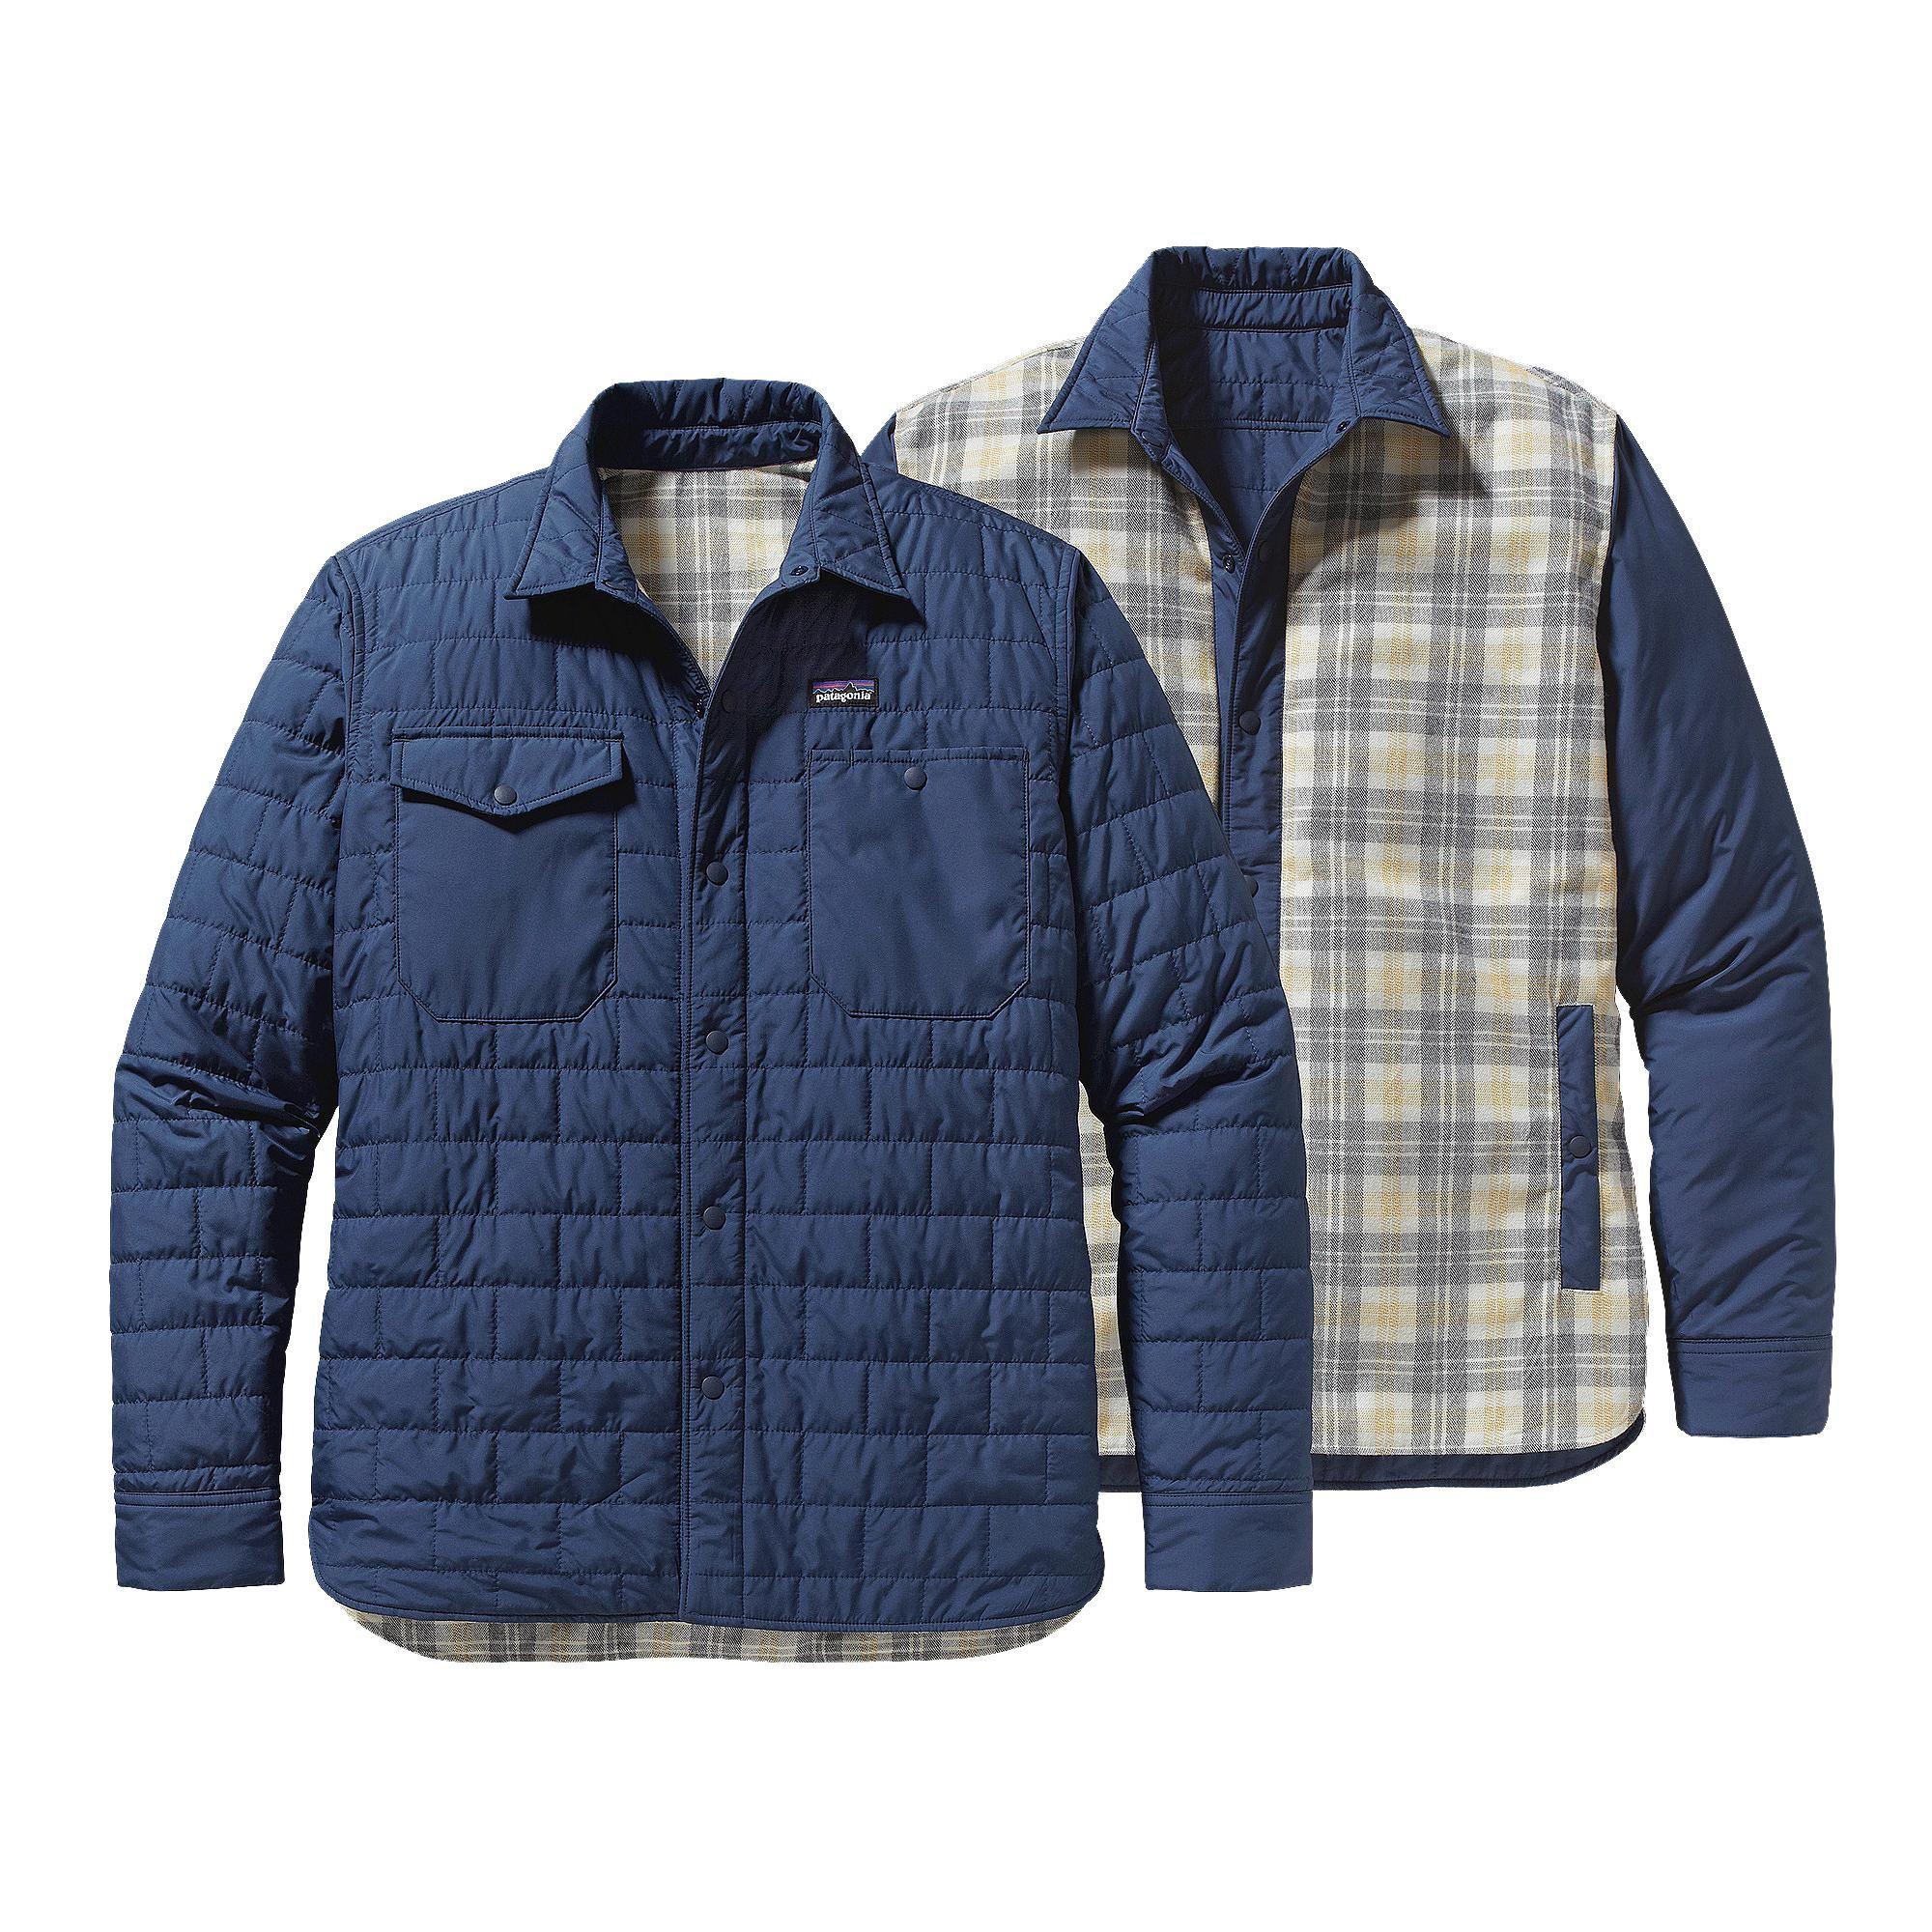 Patagonia Men's Gratio Jacket - Nano inspired shirt-jacket made of ... : patagonia quilted jacket - Adamdwight.com